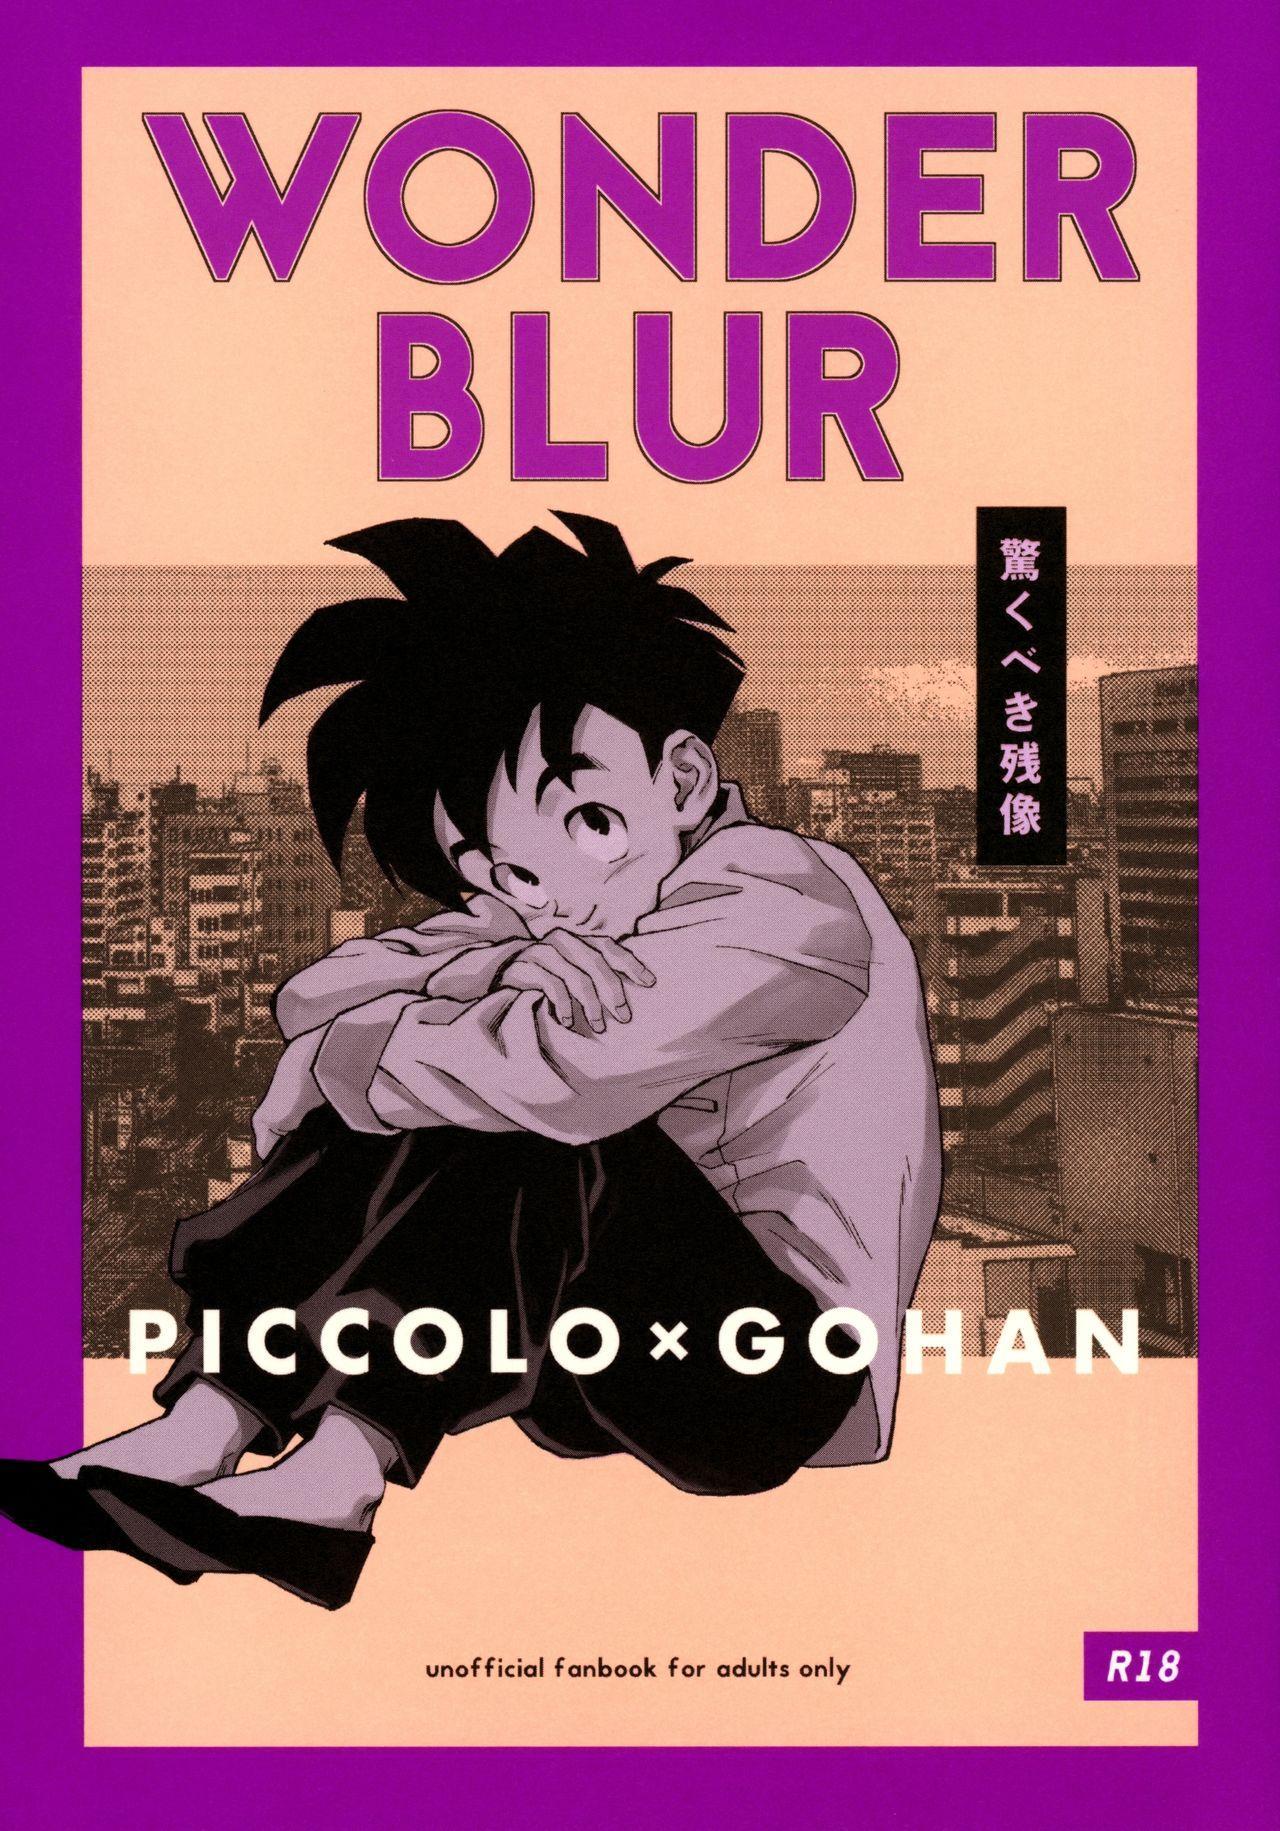 Odorokubeki Zanzou - WONDER BLUR 0